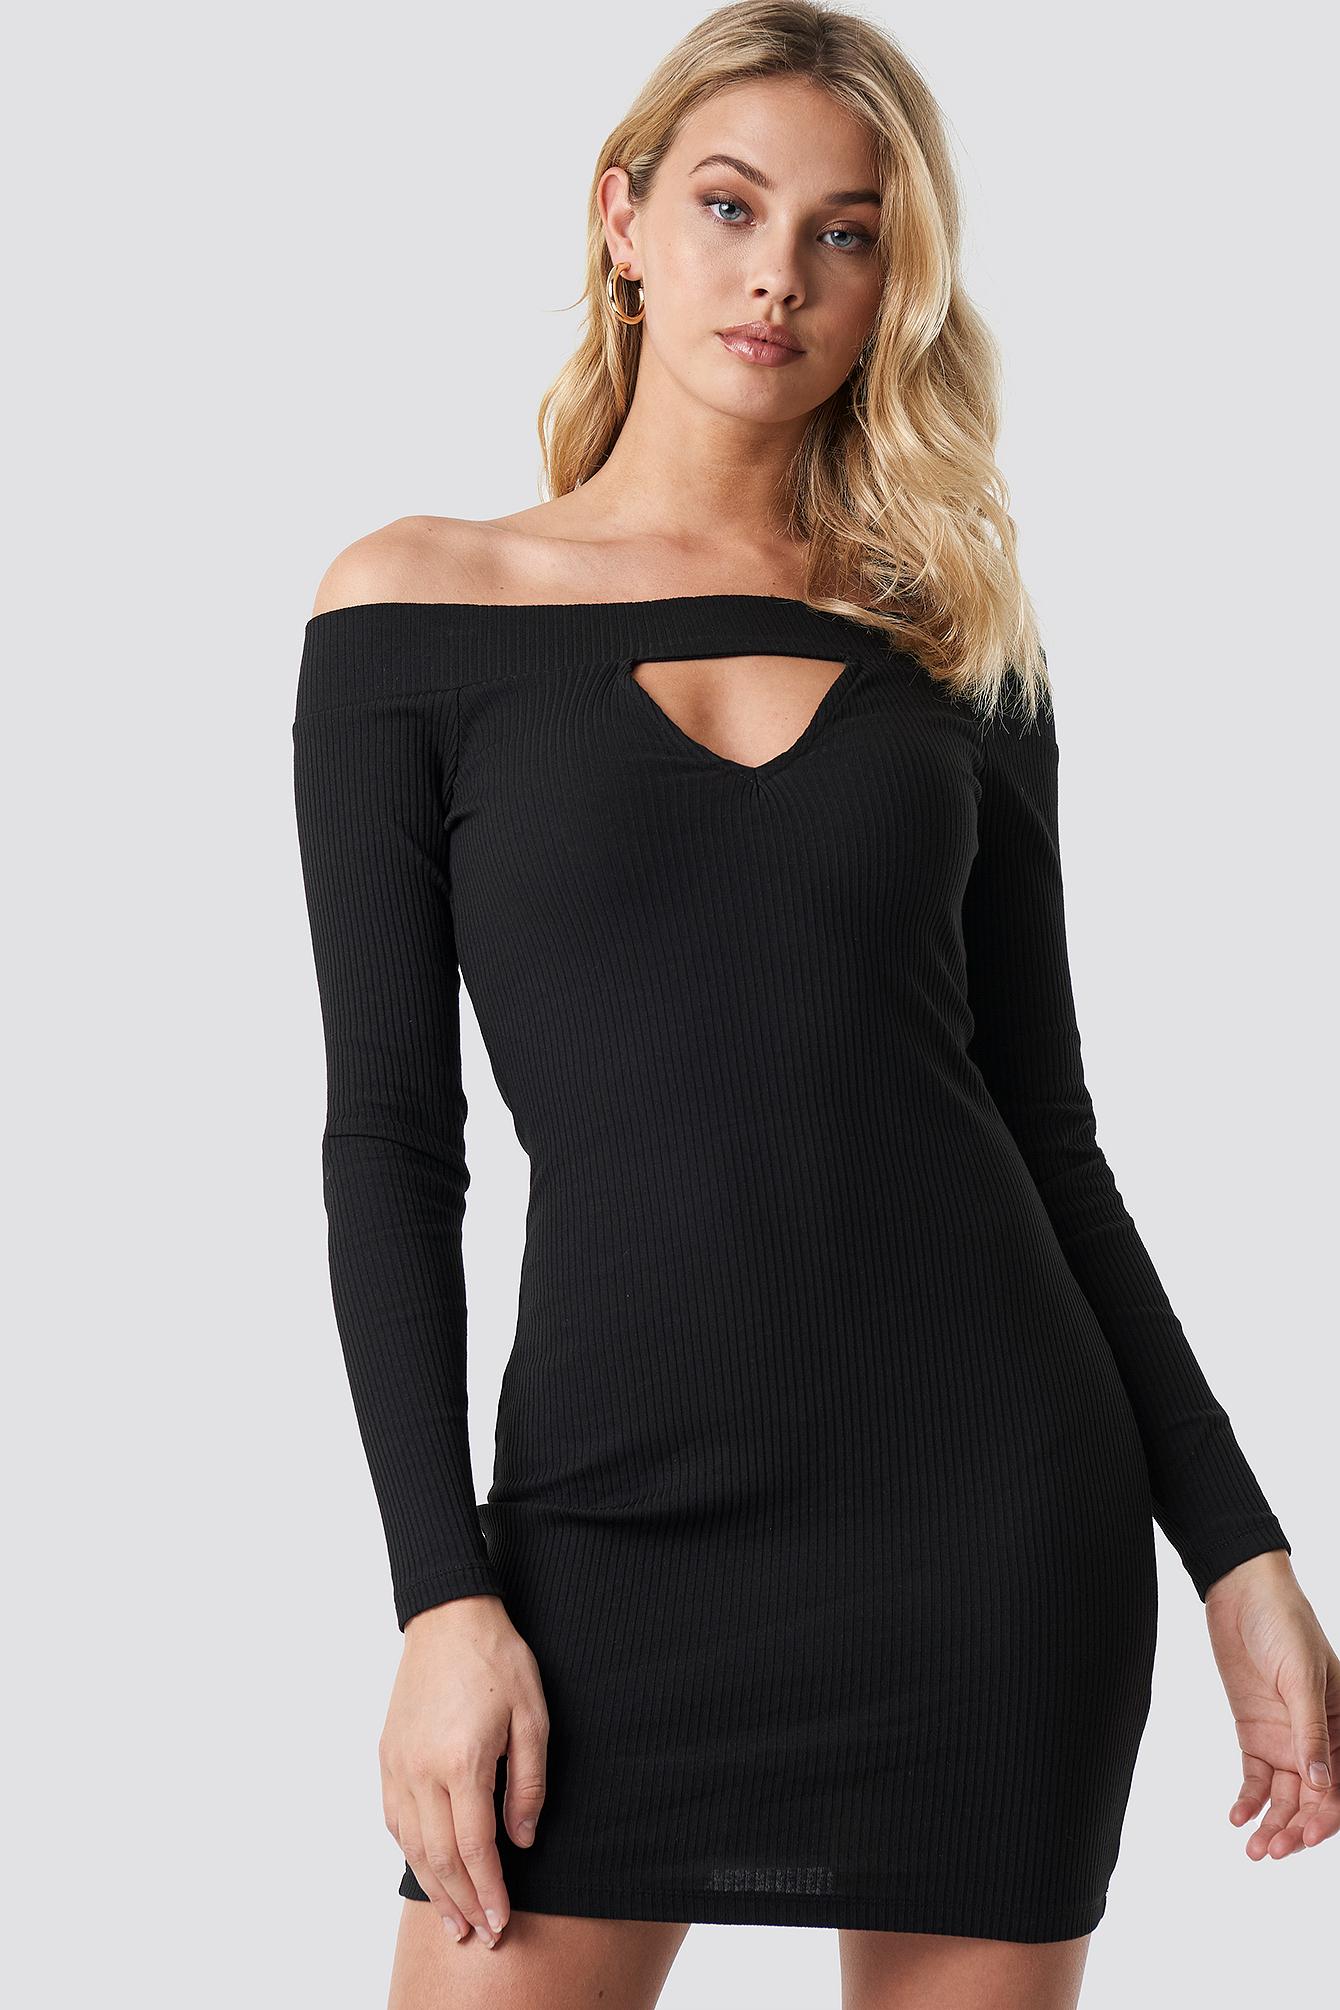 ANNA NOOSHIN X NA-KD Off Shoulder Cut Out Ribbed Dress - Black